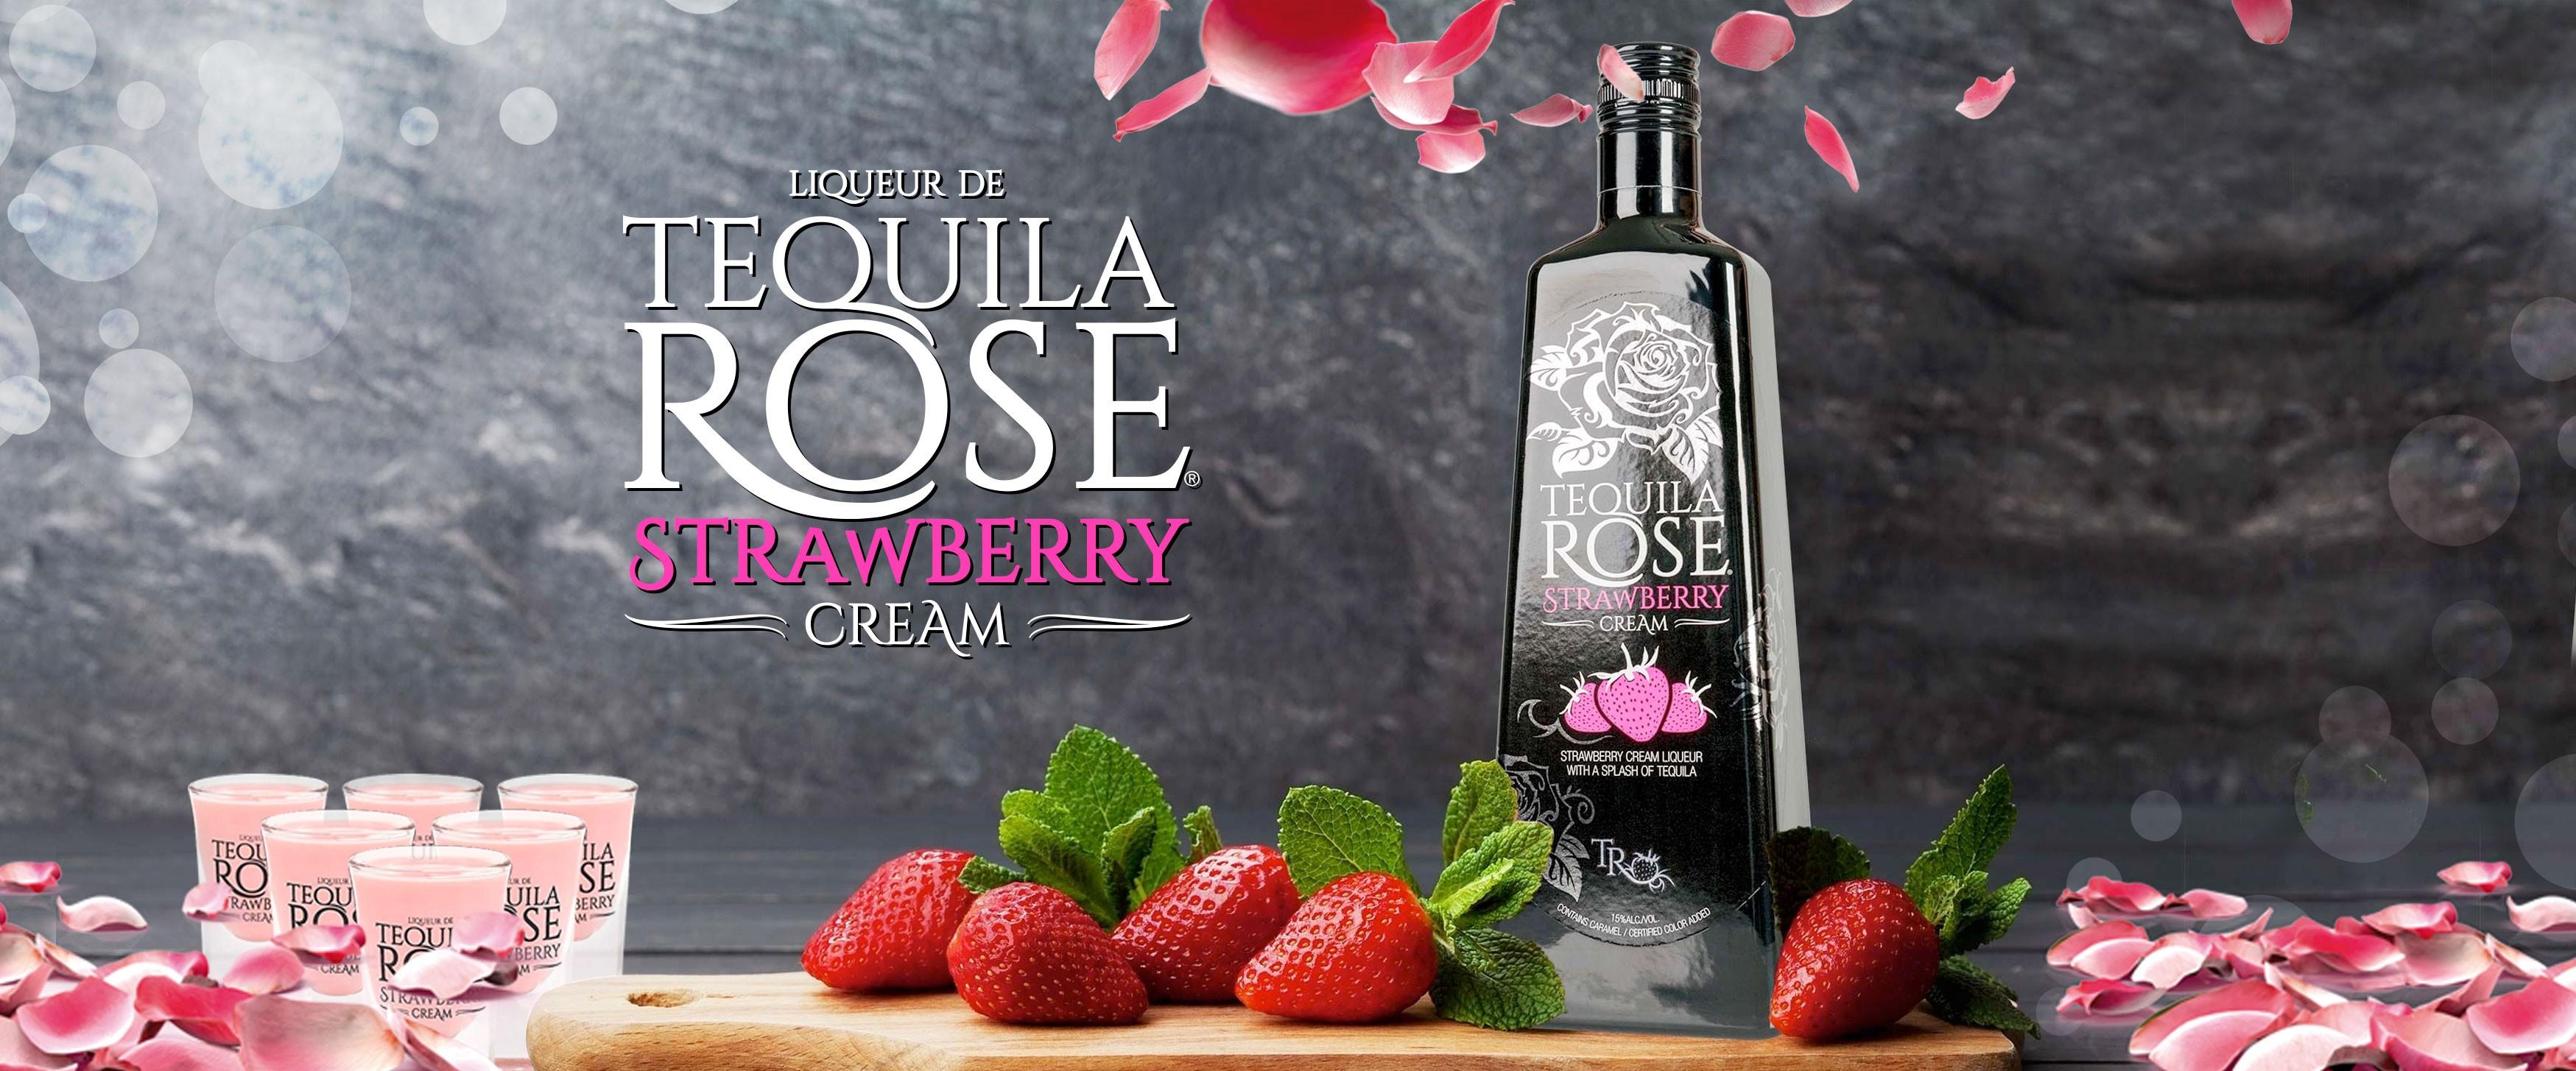 tequila strawberry cream